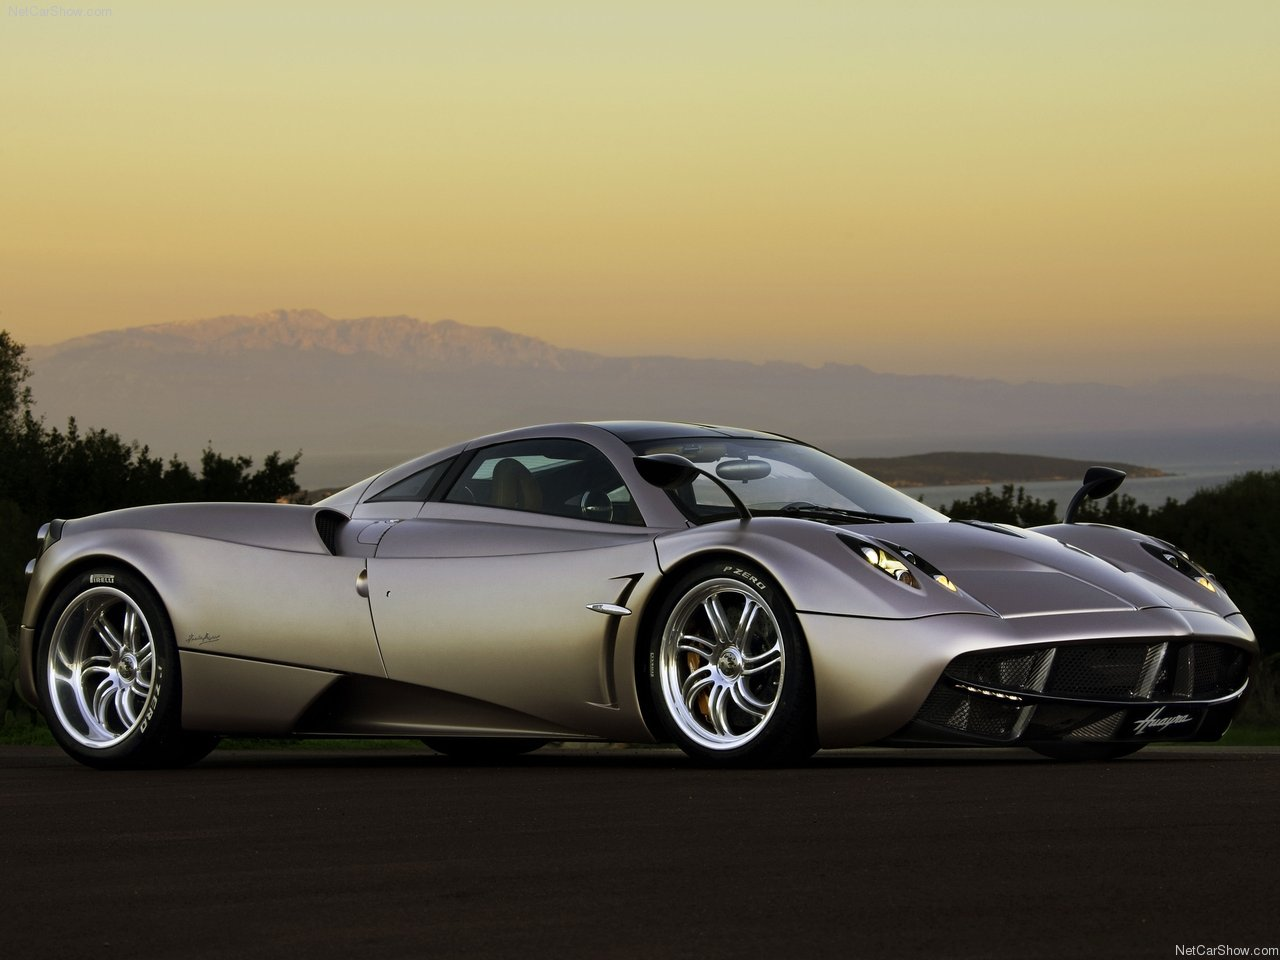 Mercedes Benz - Pagani relationship   Car guy's paradise